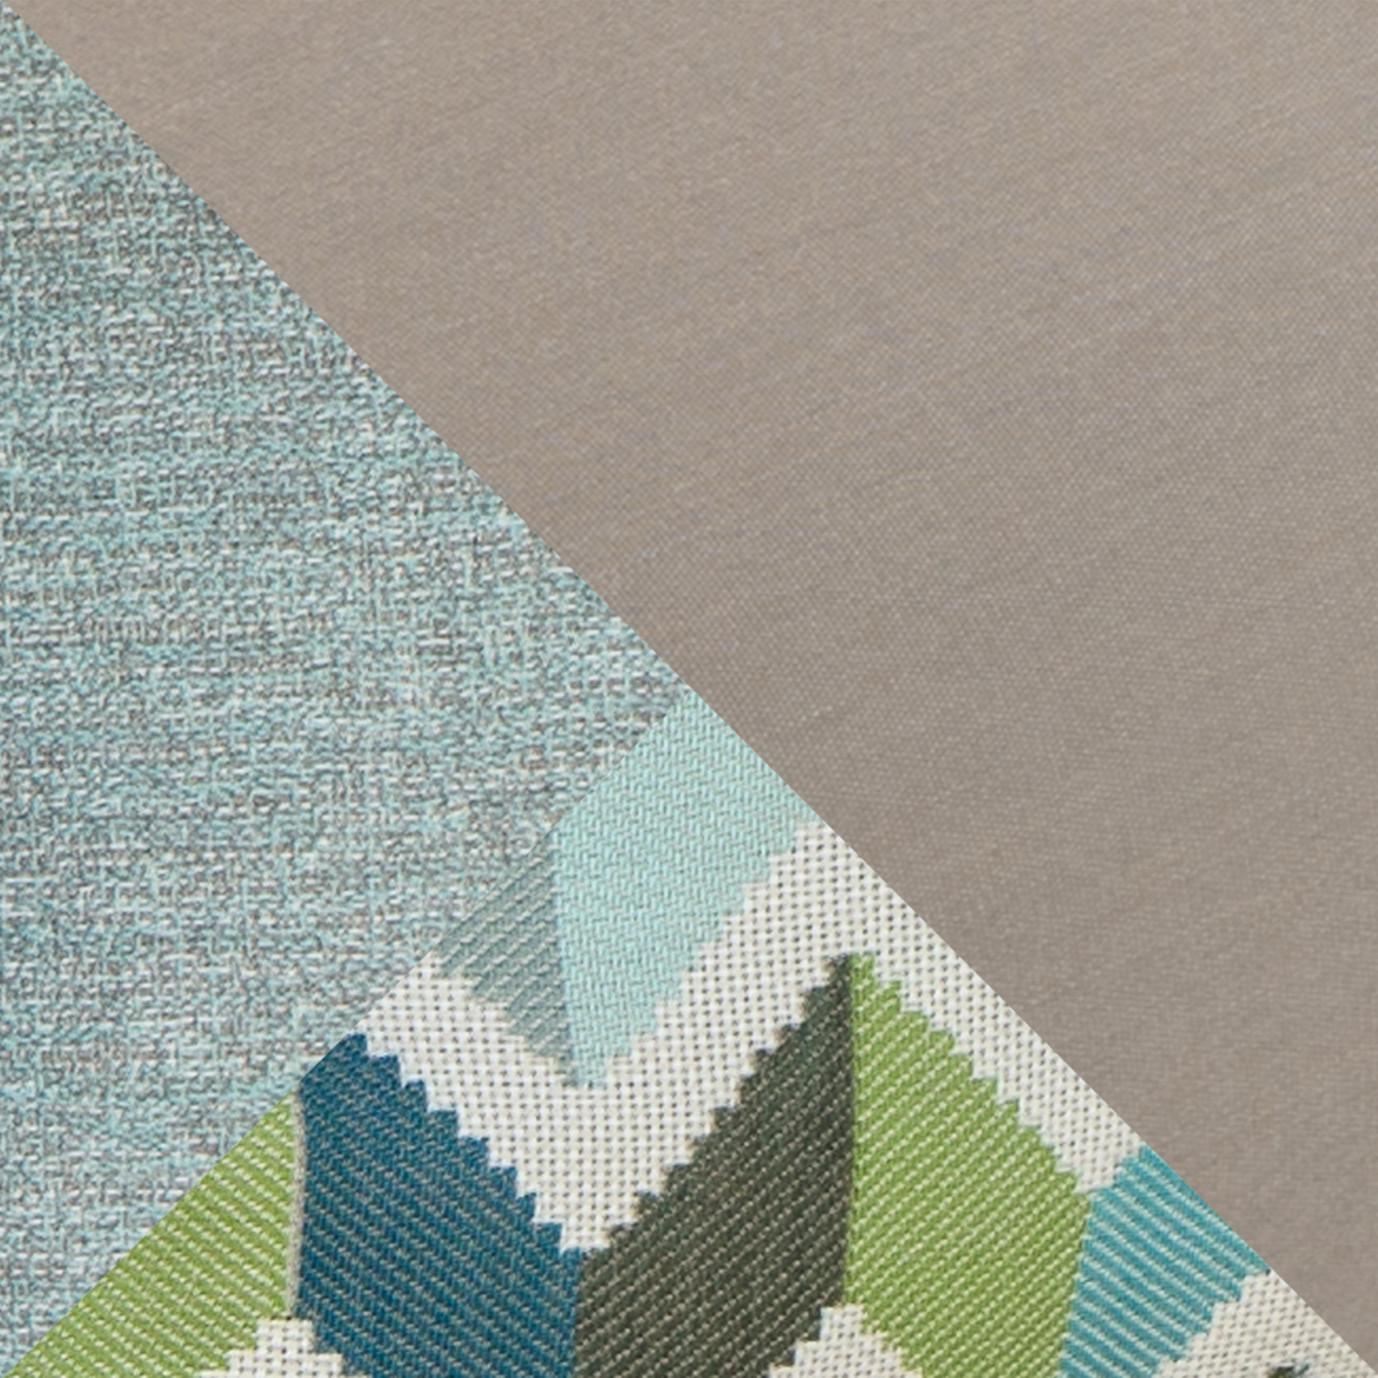 Portofino® Comfort 6pc Sofa Sectional with Stone - Taupe Mist